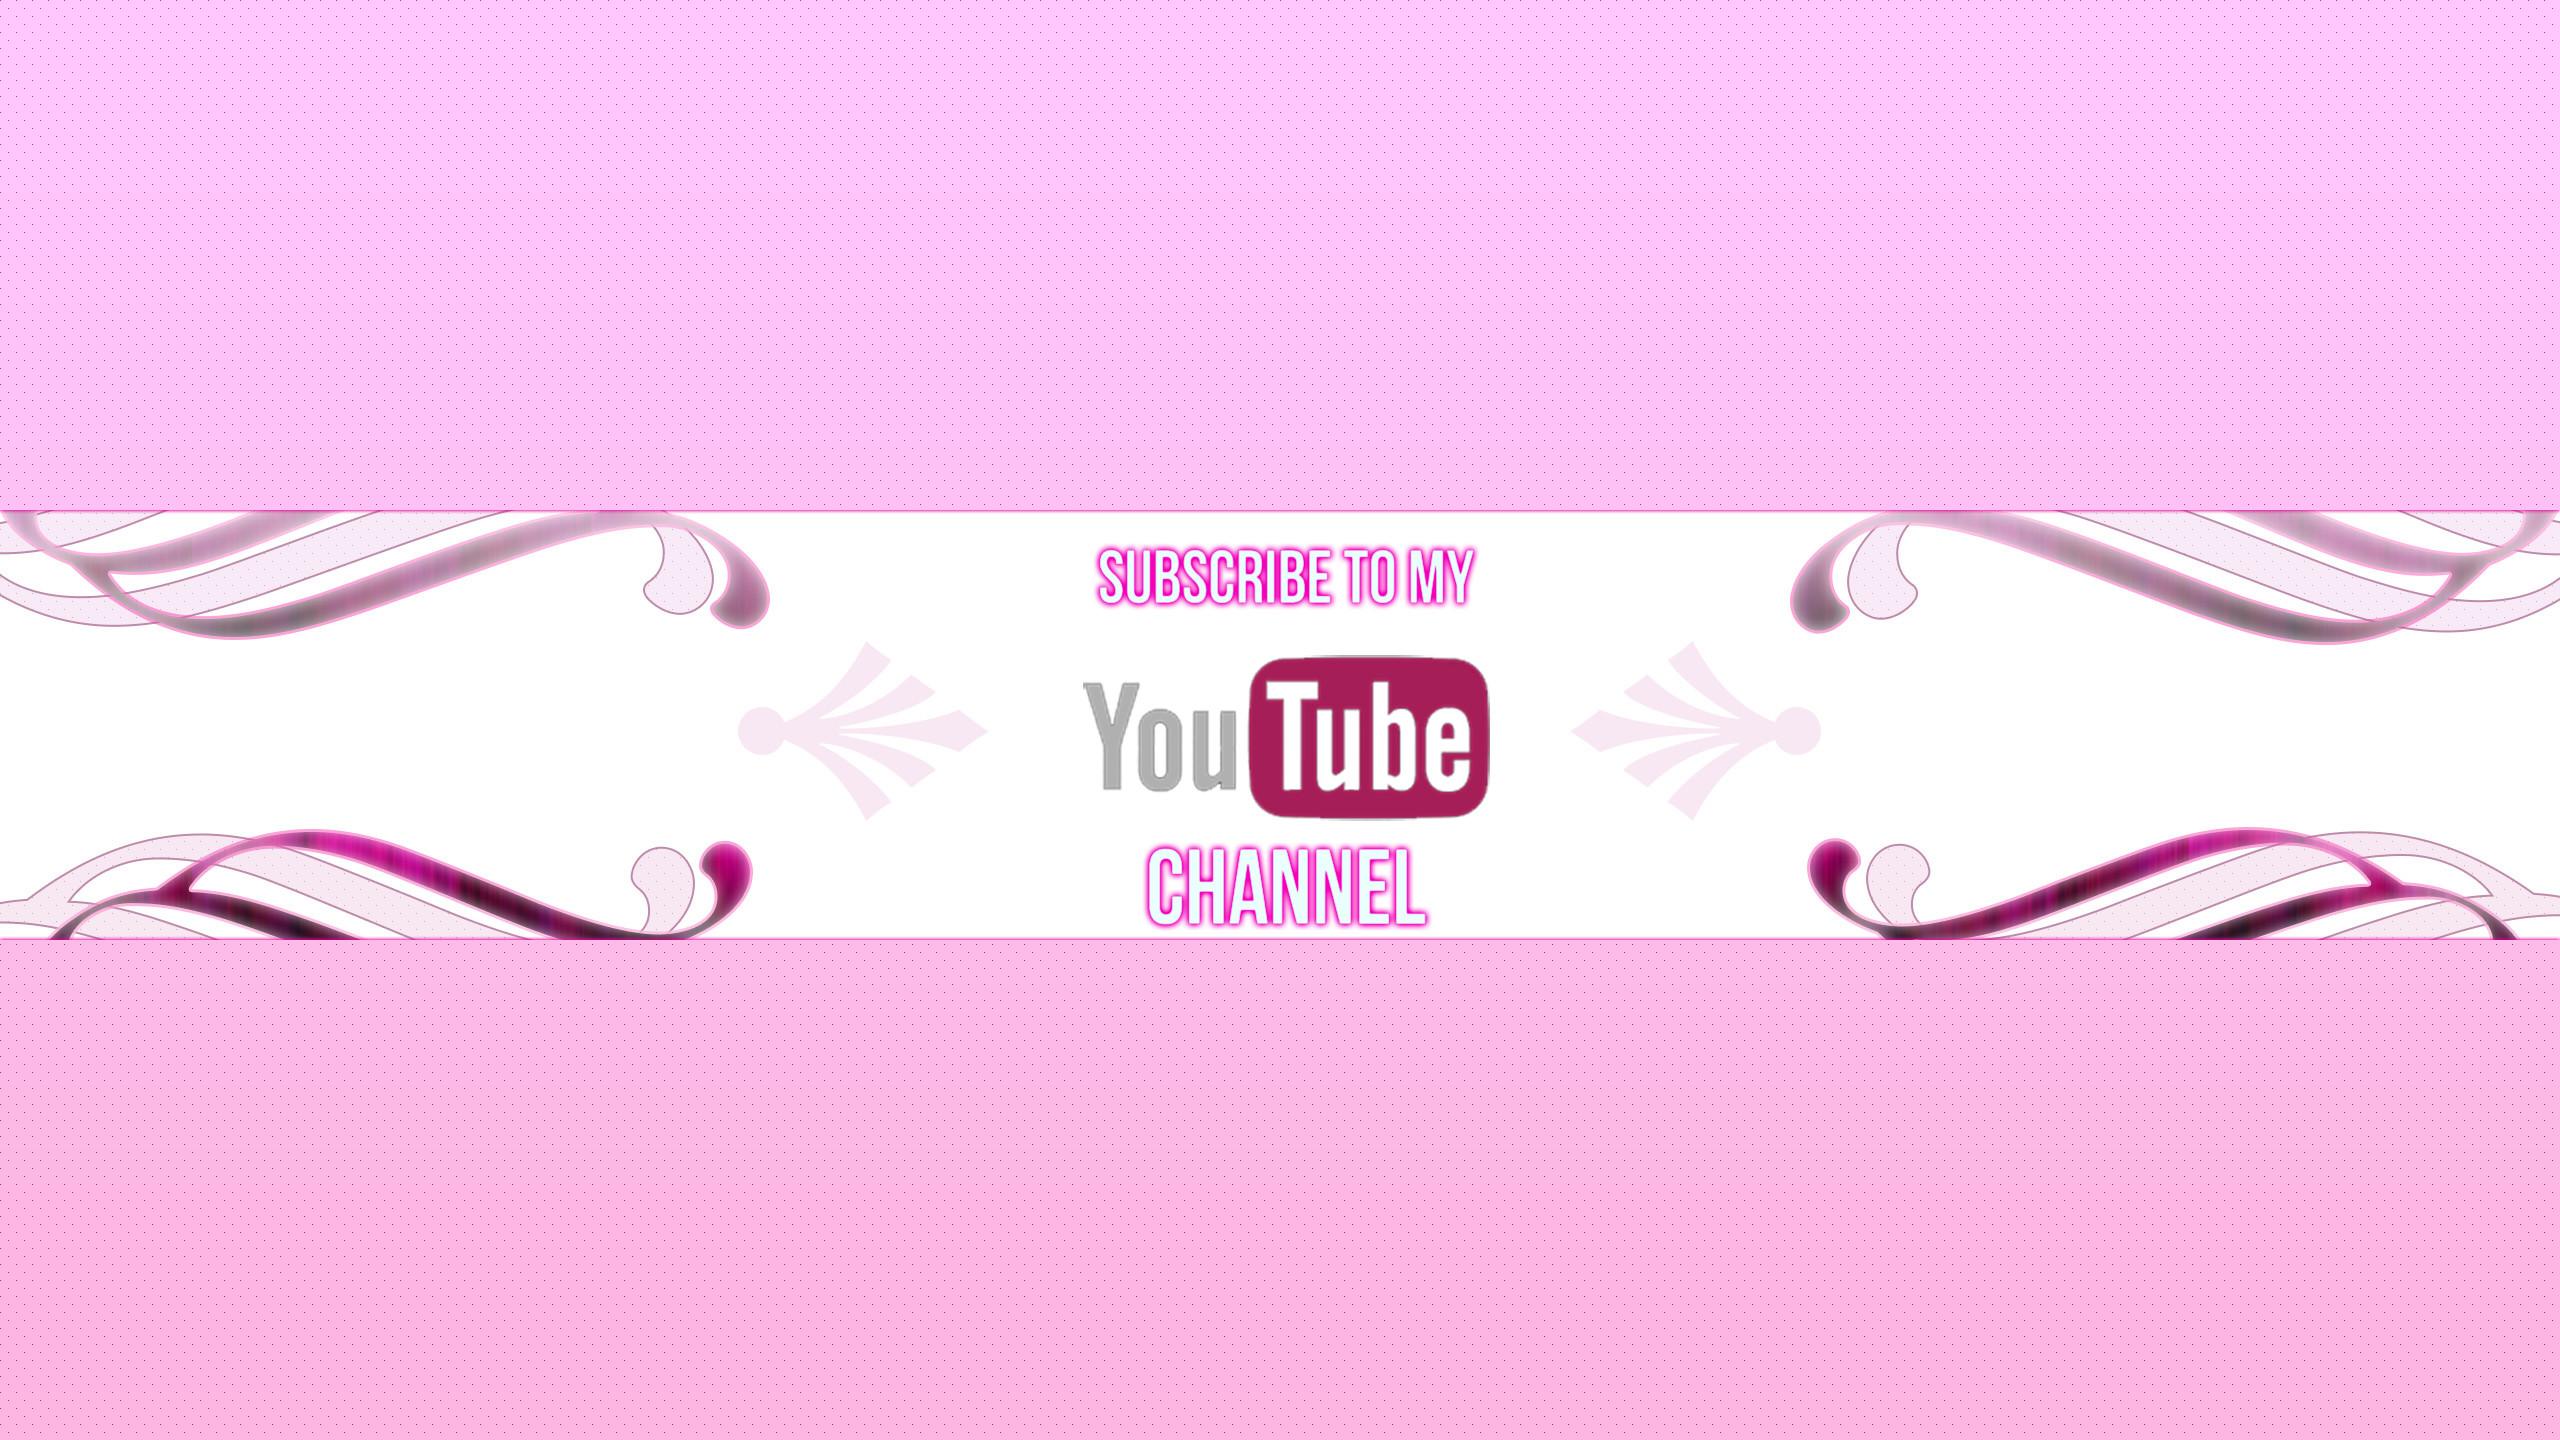 Girly Youtube Channel Art